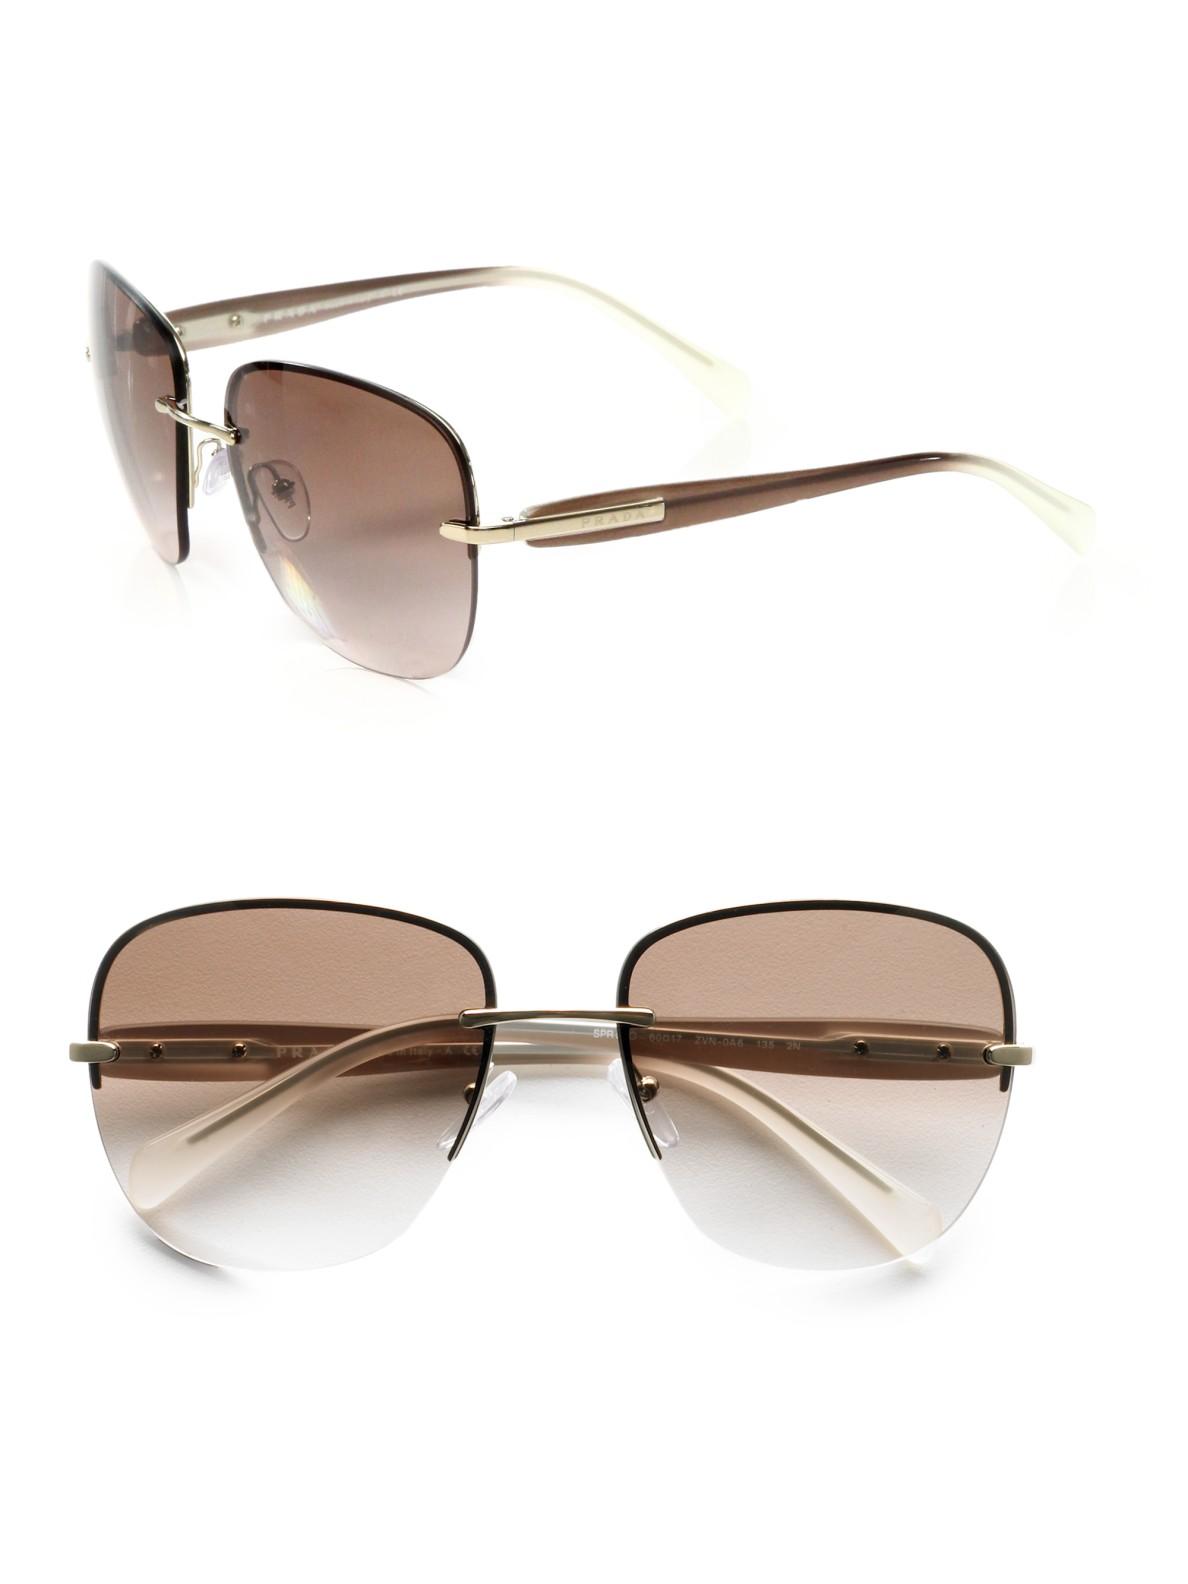 3609ba8a3be ... shop lyst prada square rimless sunglasses in brown 8b34f 454df